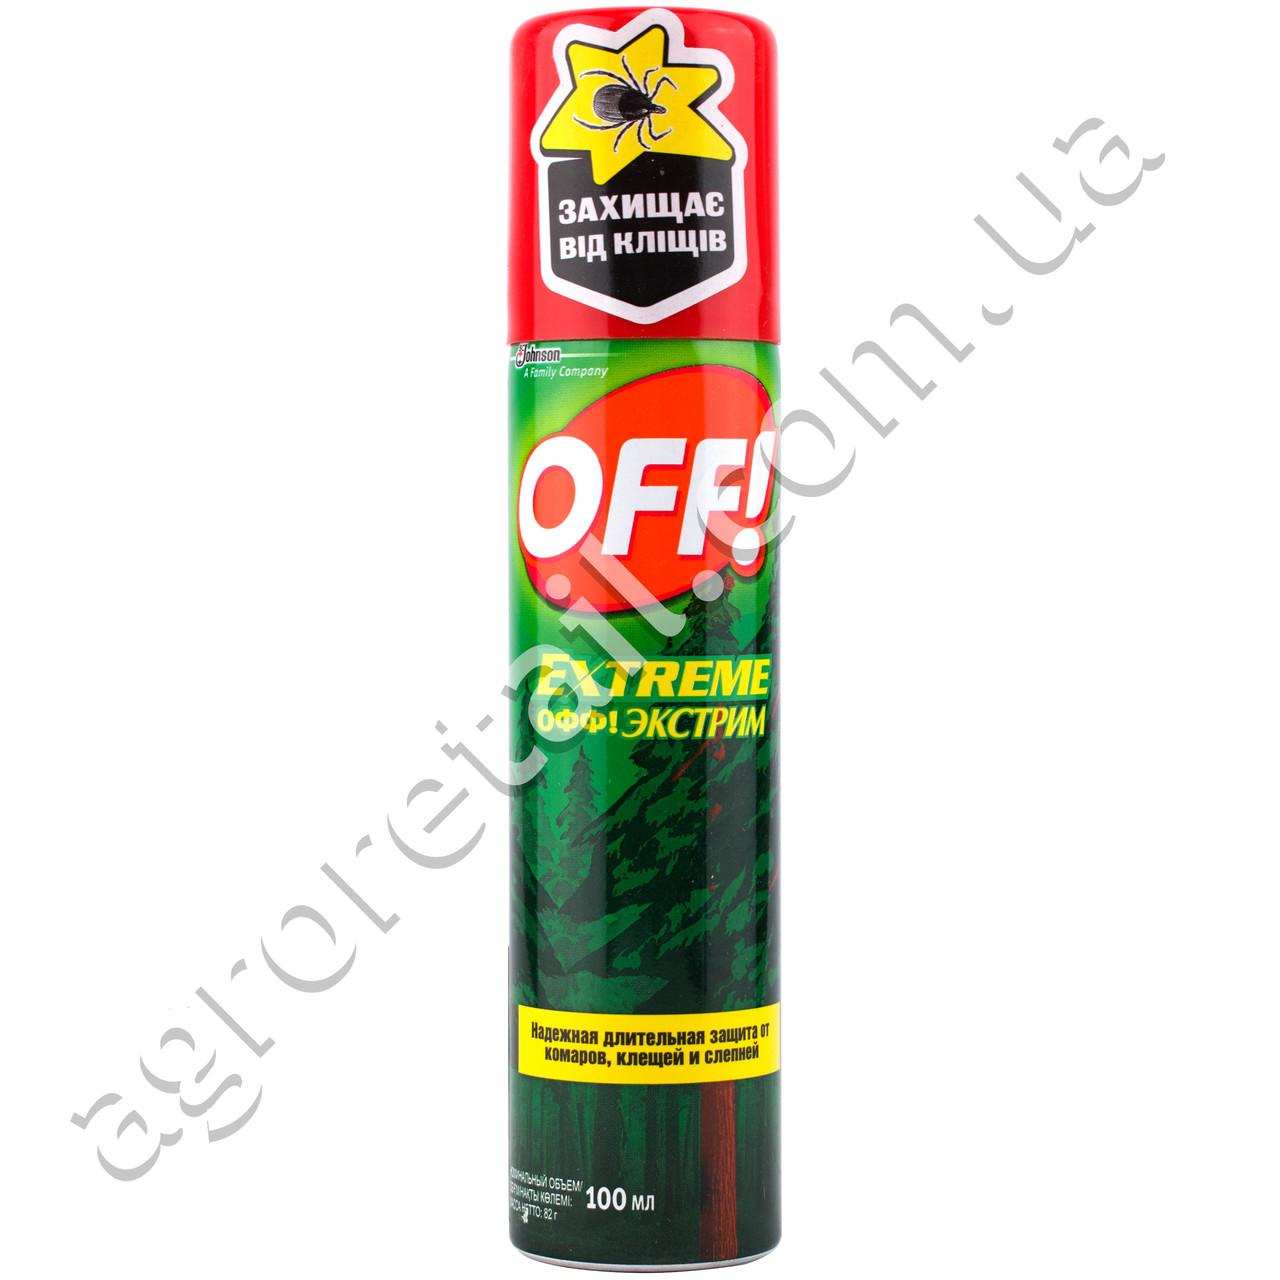 Аэрозоль от комаров Off Extreme 100 мл